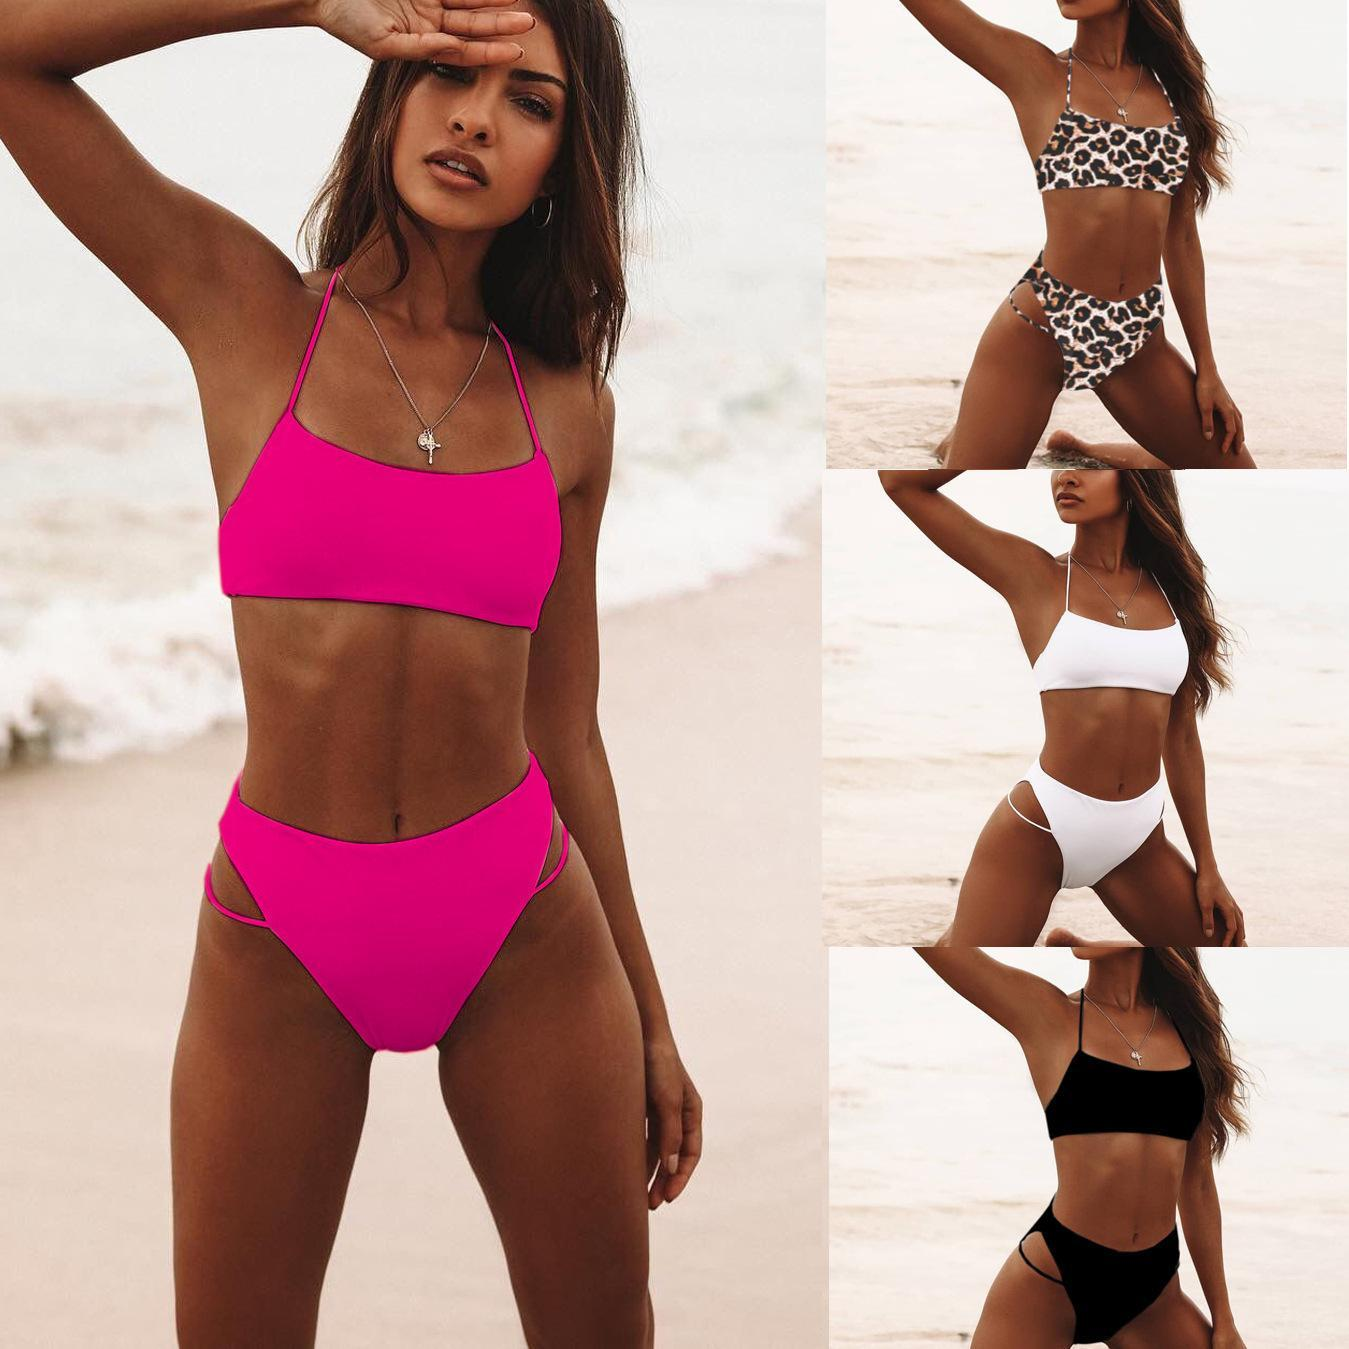 J -4 Sexy Bikinis Sólido Push Up Bikini 2019 Venta caliente Sujetador acolchado Correas de cintura Alta Cintura Traje de baño Traje de baño Mujer Imprime BIQUINI XL AURORA